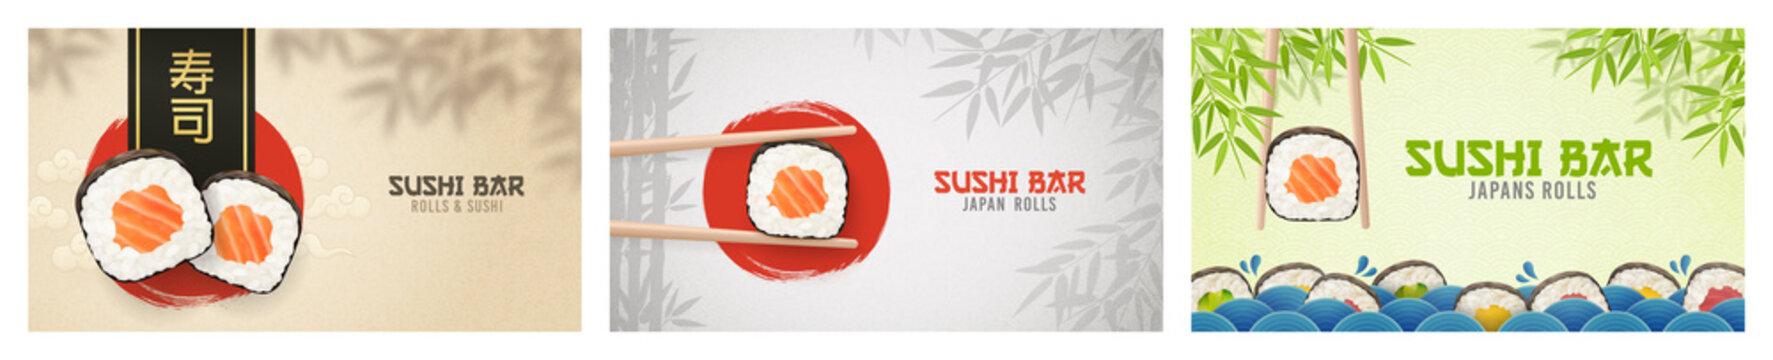 Asian Food poster. Sushi ads. Poster of Sushi Restaurant. Vertical flyer. Realistic vector illustration.